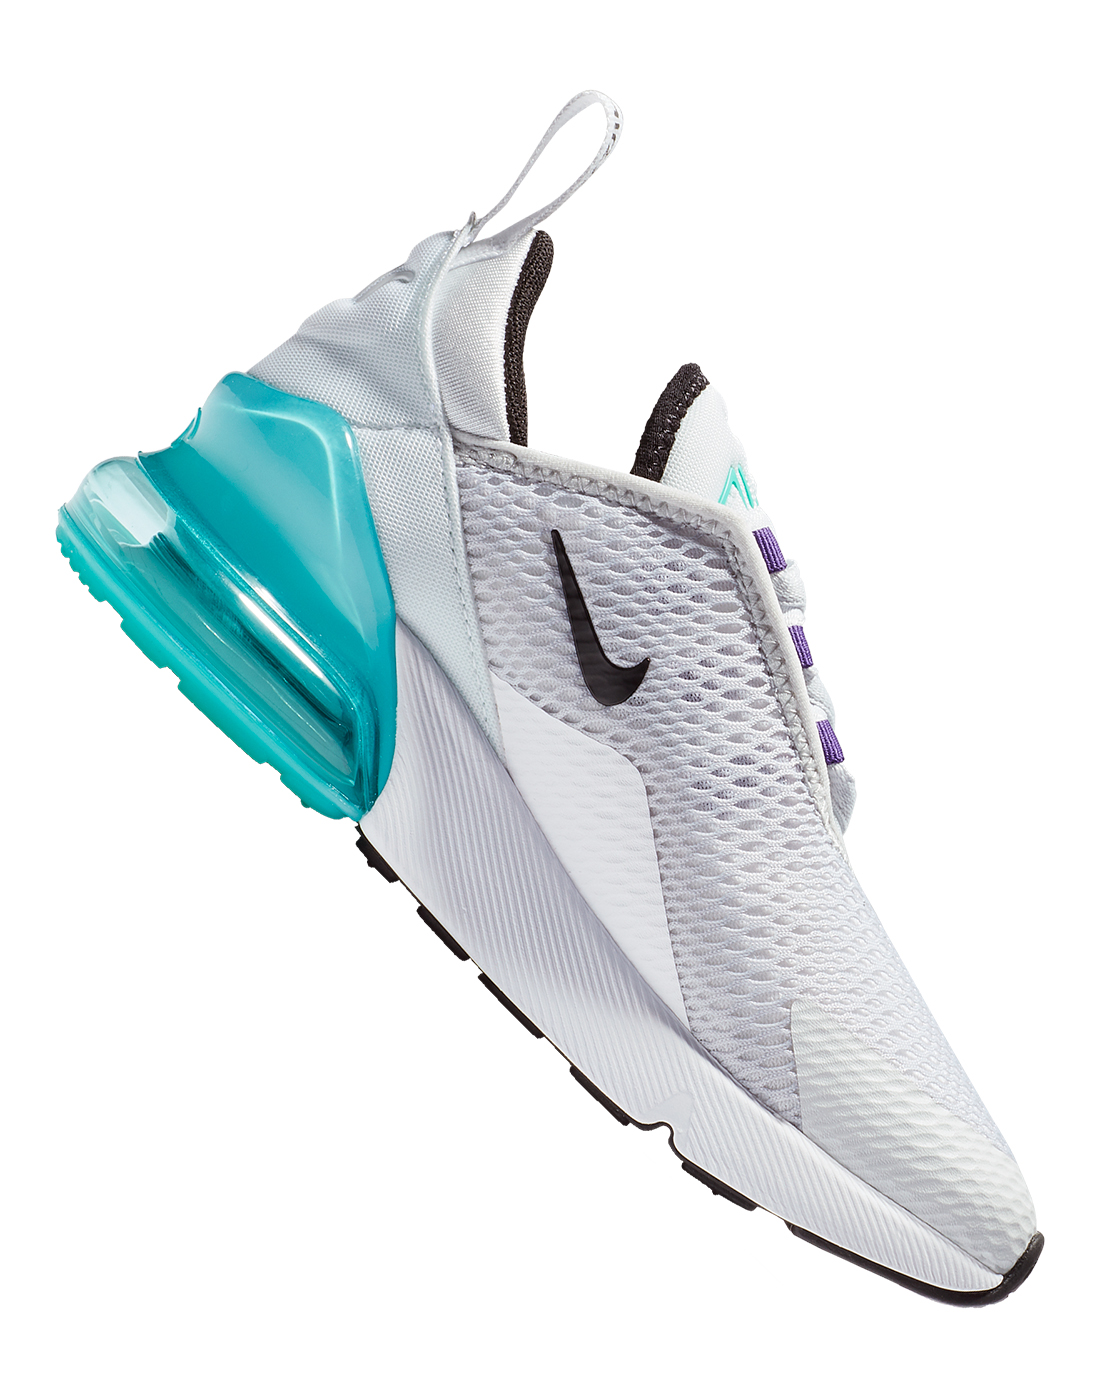 Unidad Sitio de Previs Banzai  Kid's White & Turquoise Blue Nike Air Max 270 | Life Style Sports